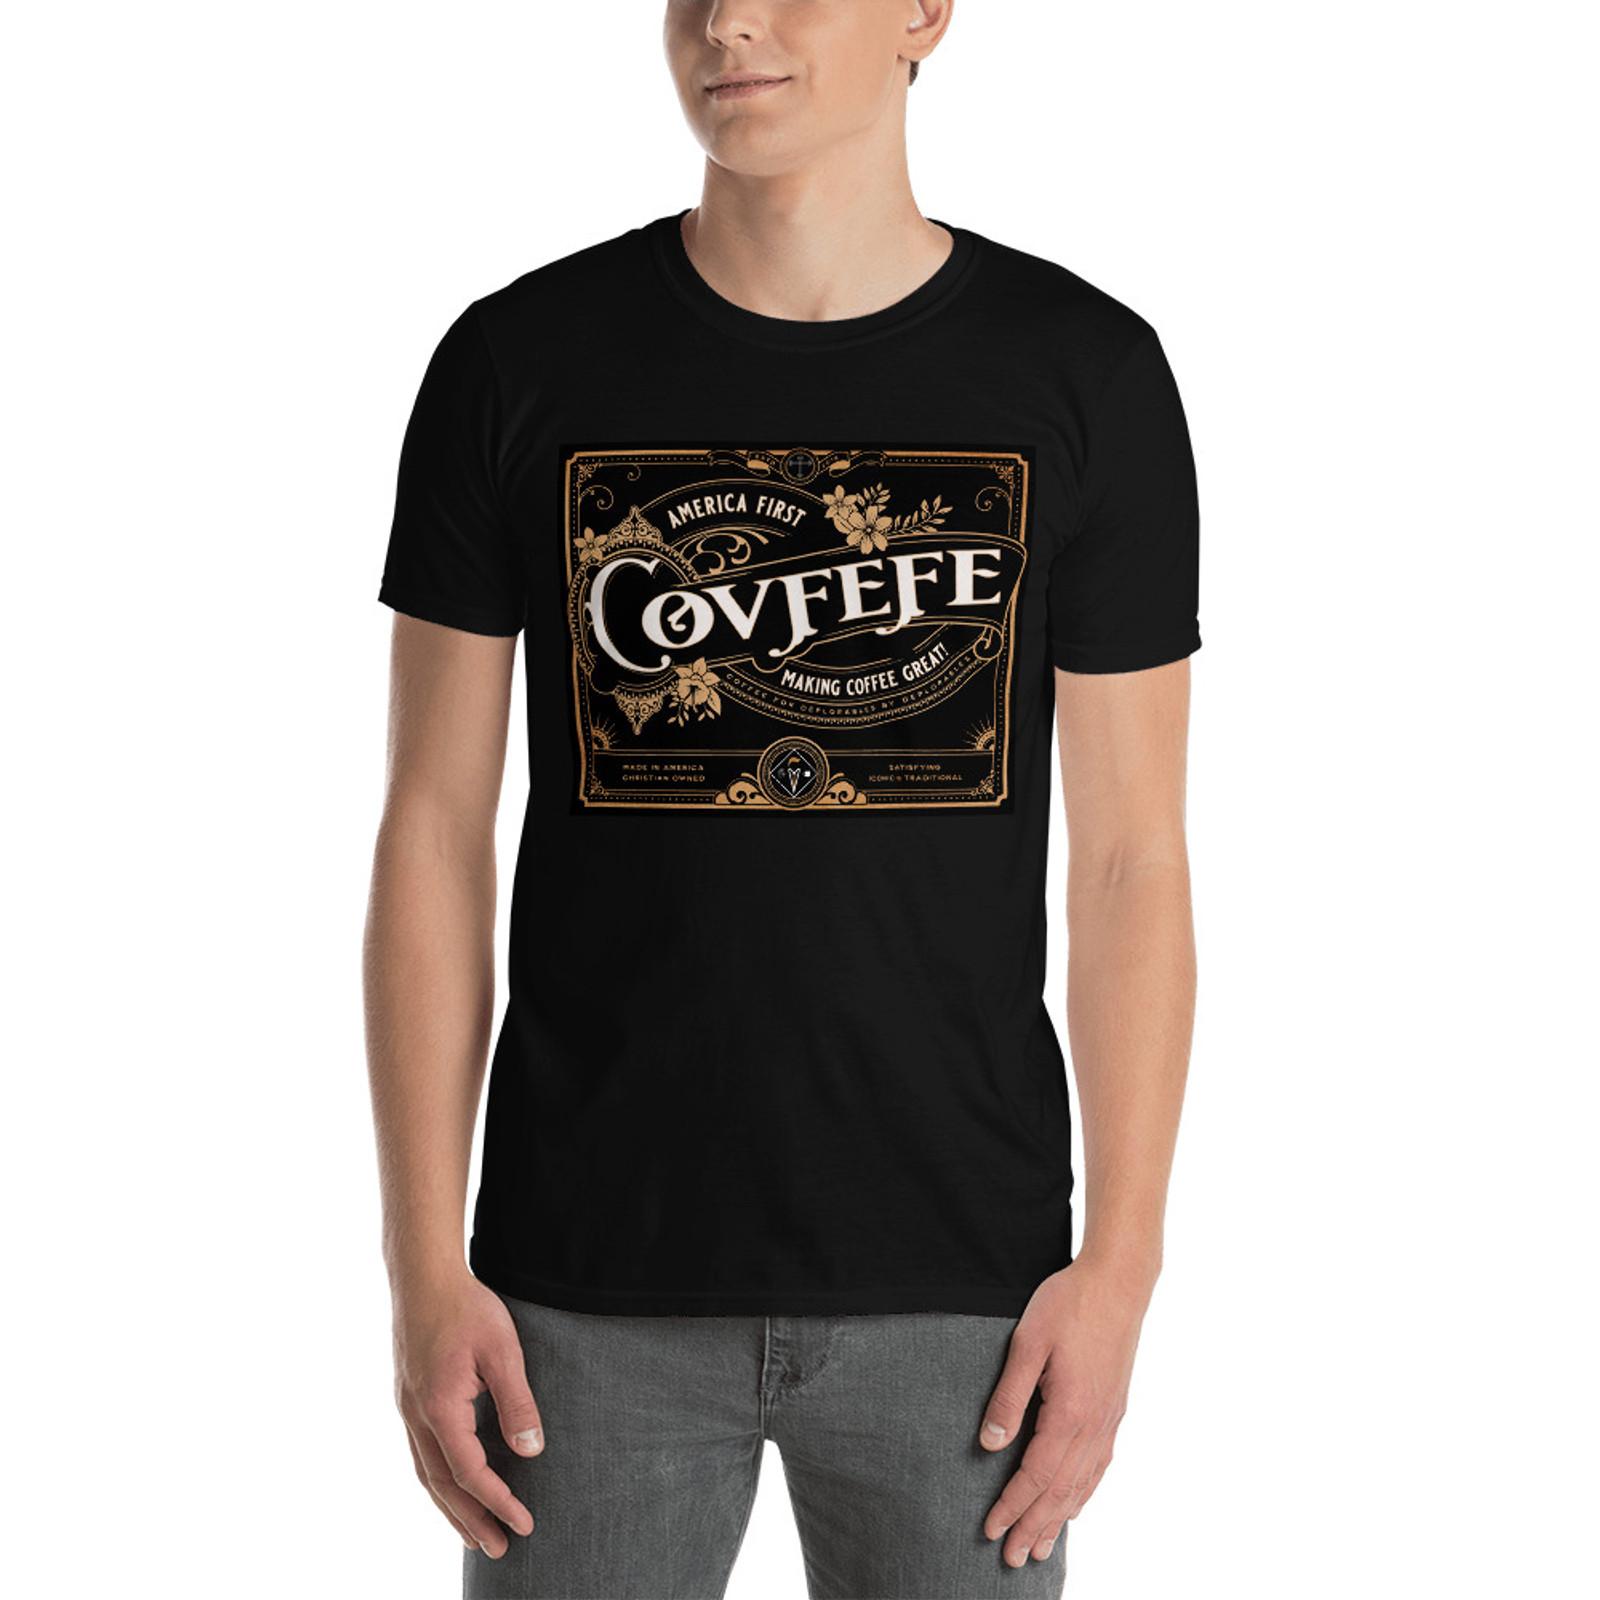 COVFEFE Vintage T-Shirt